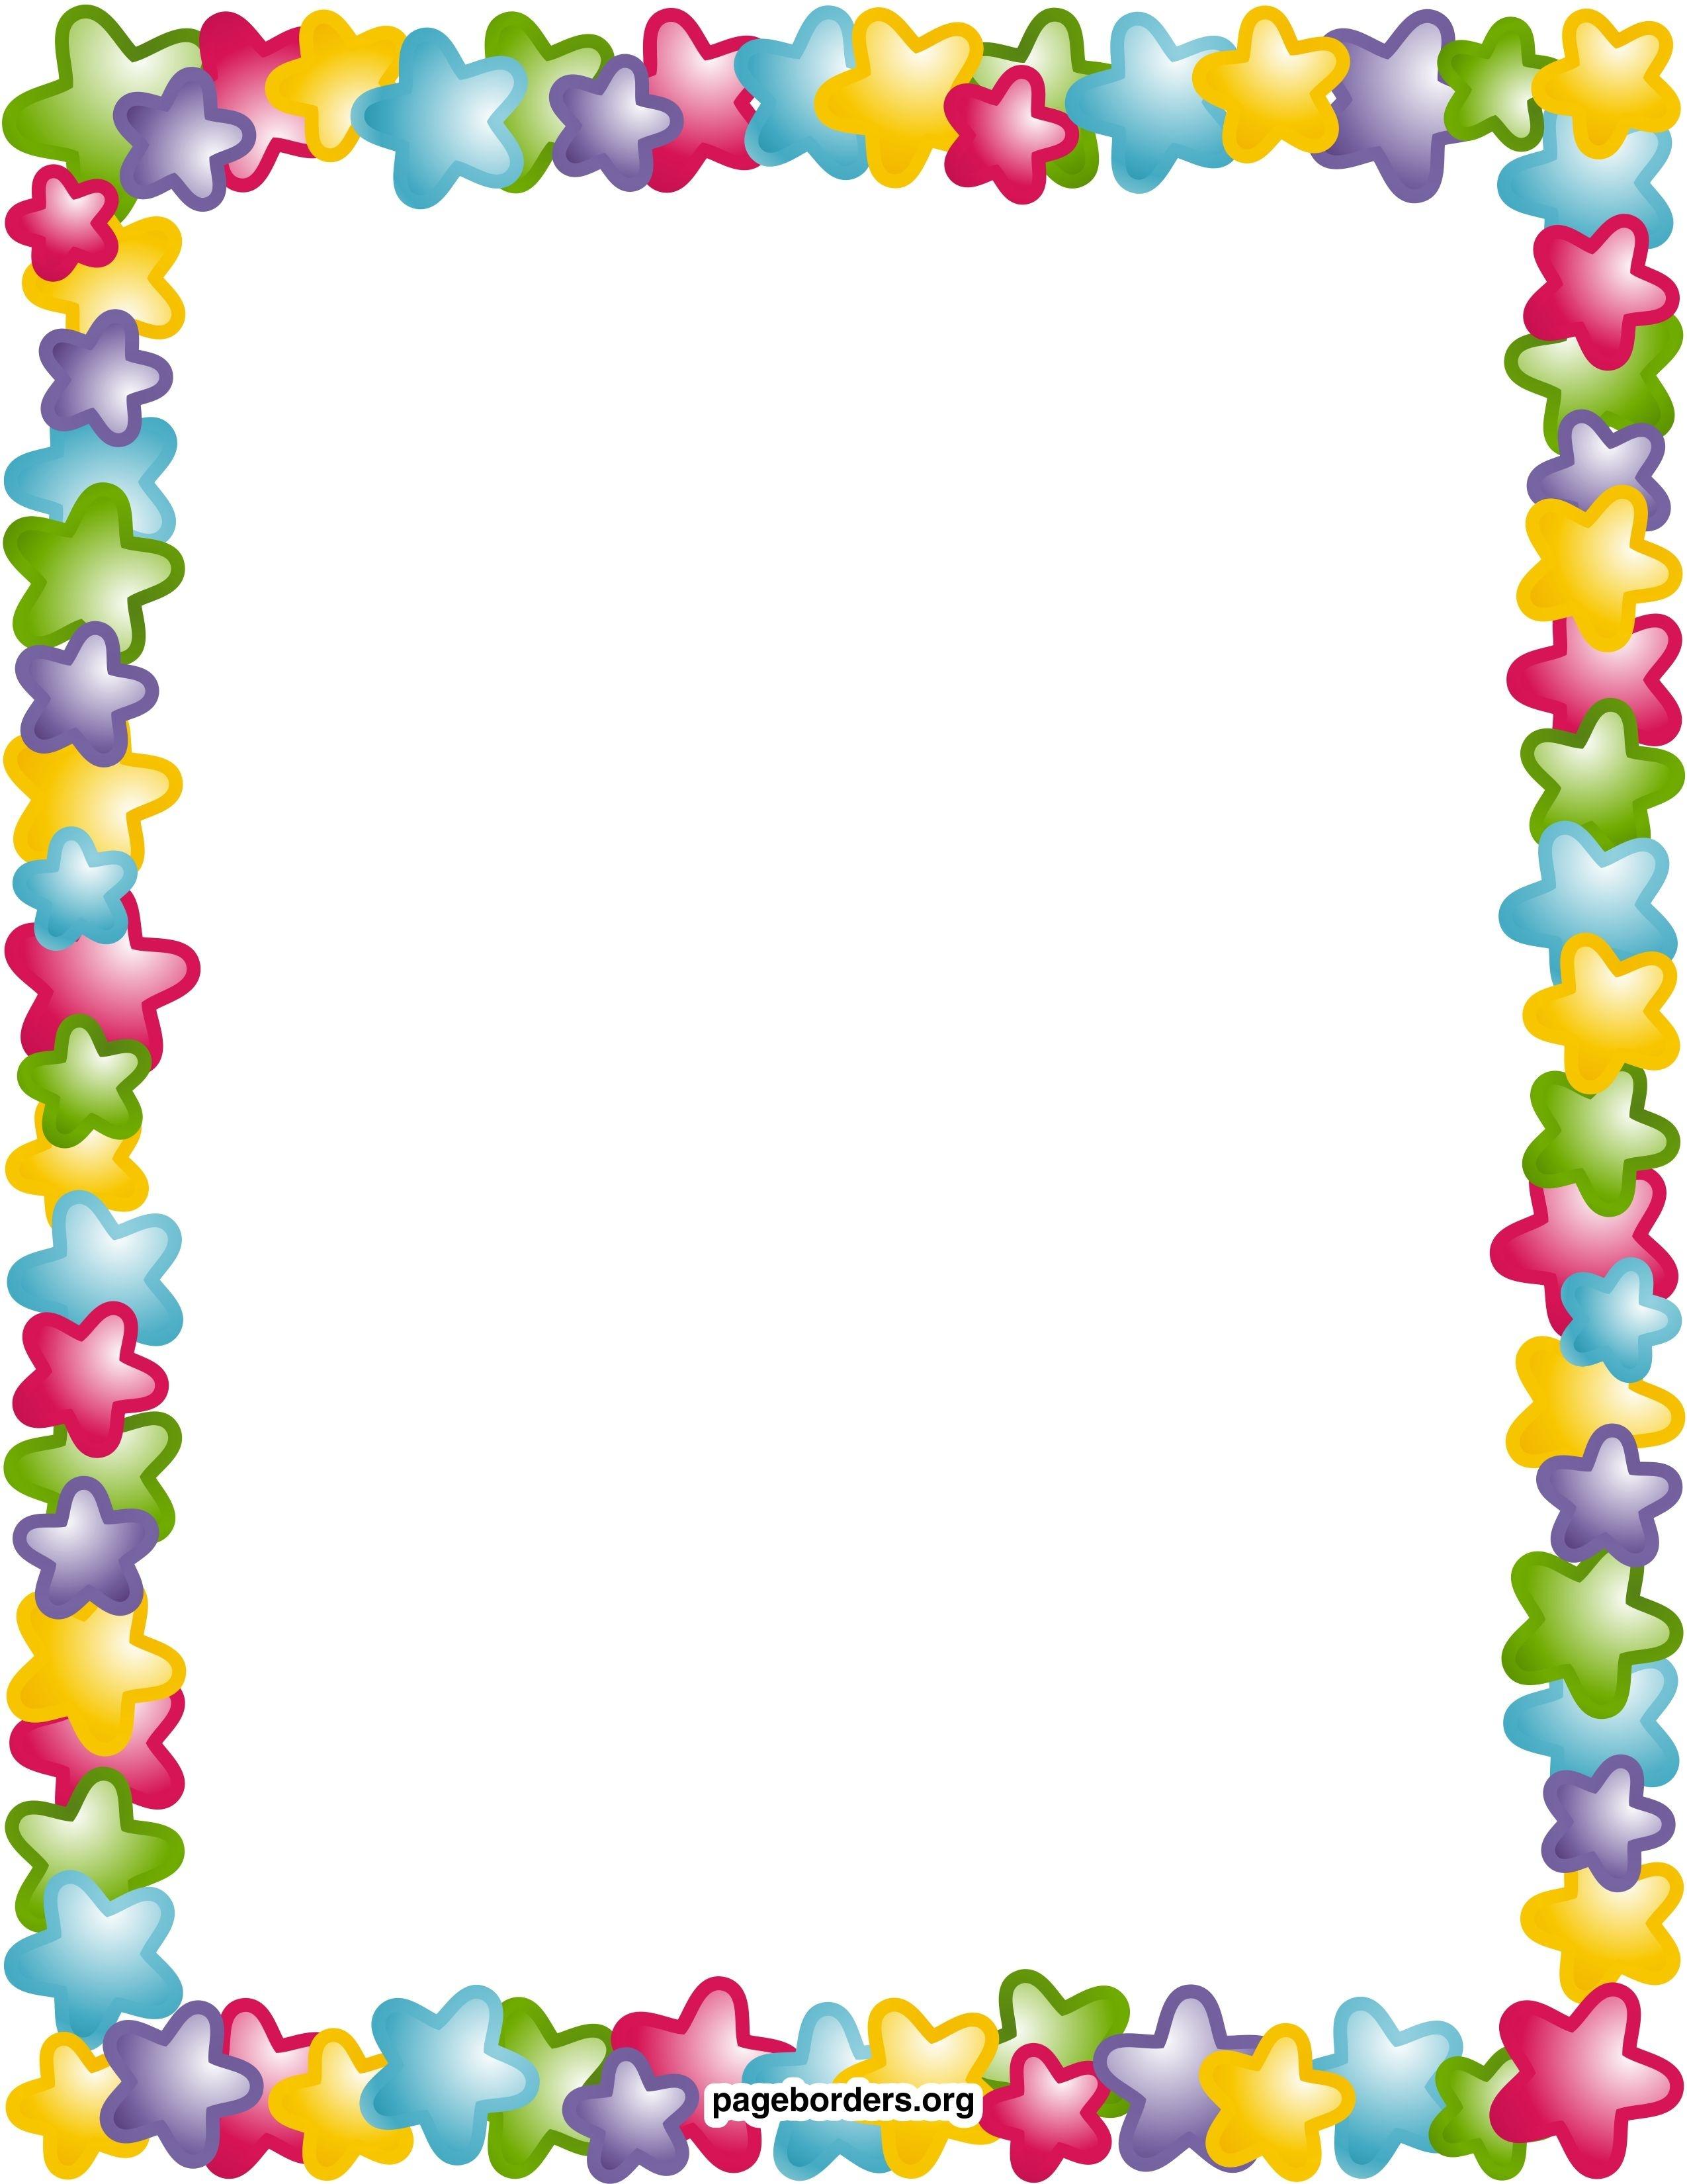 Star Border Clip Art Clipart Panda Free Clipart Images | Printable - Writing Borders Free Printable